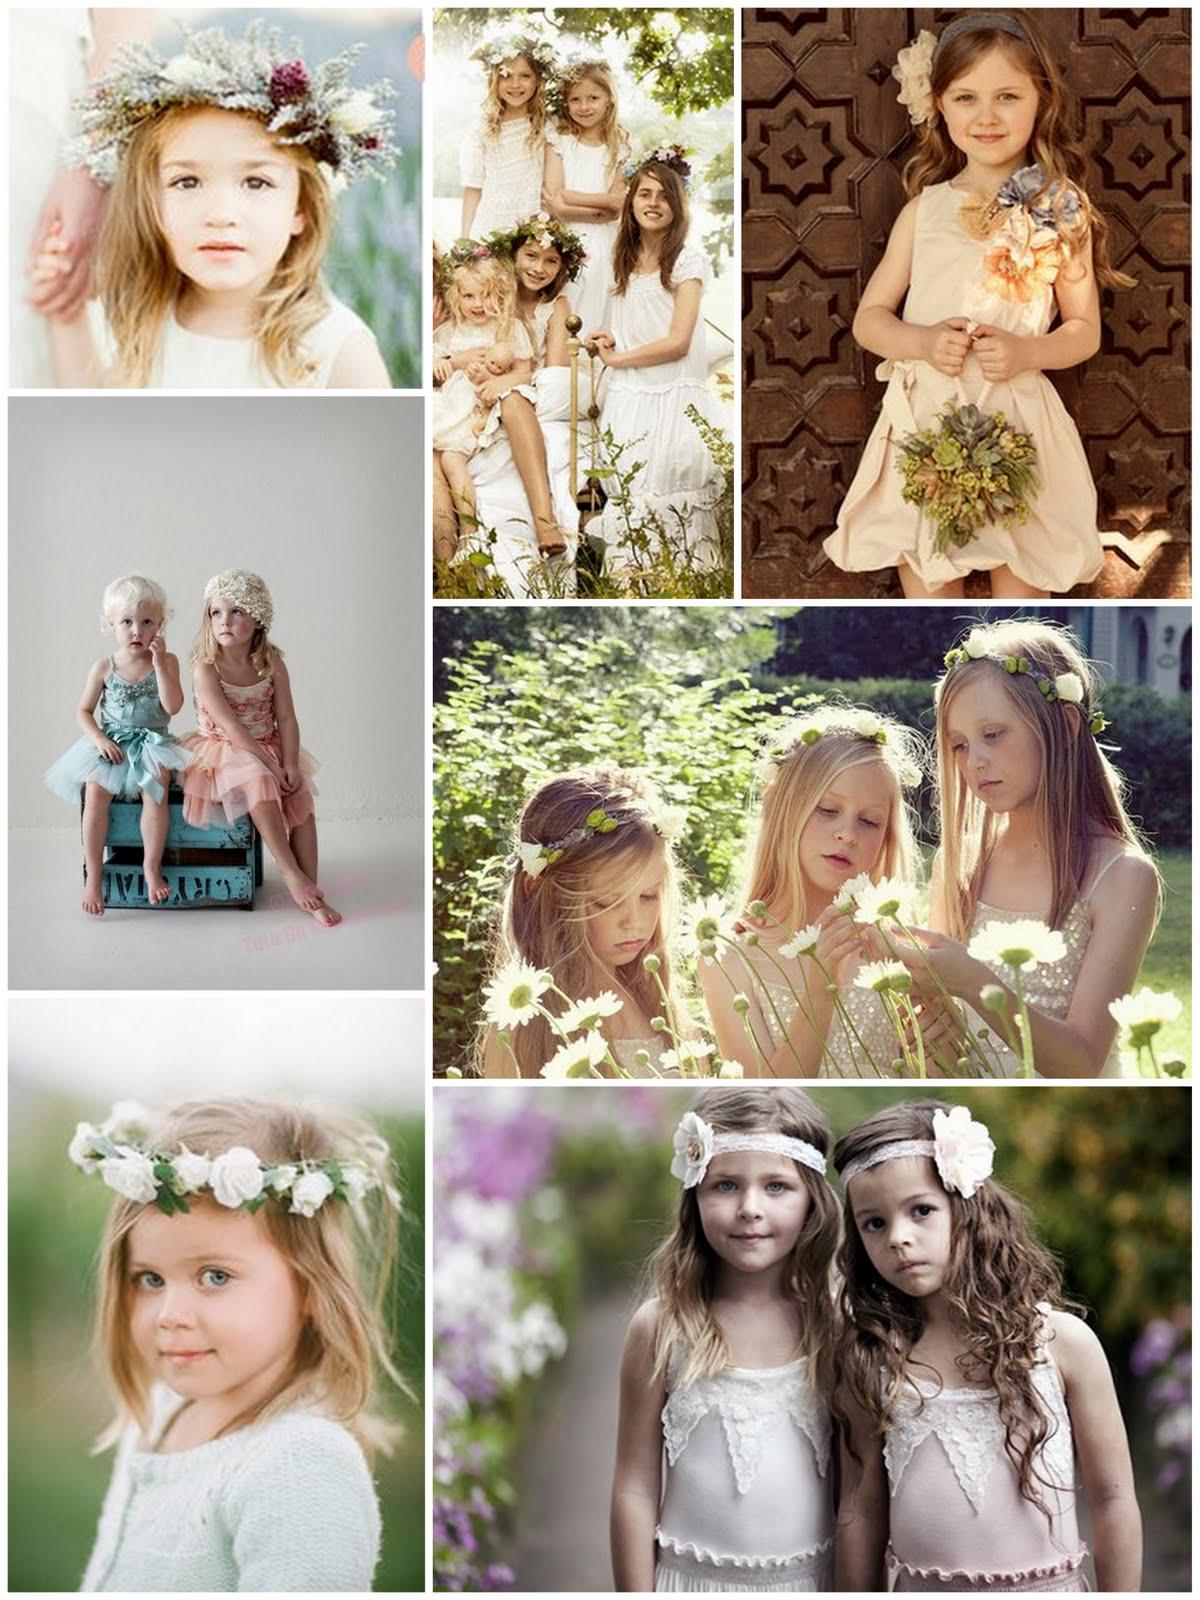 Wedding Flower Girl Vintage